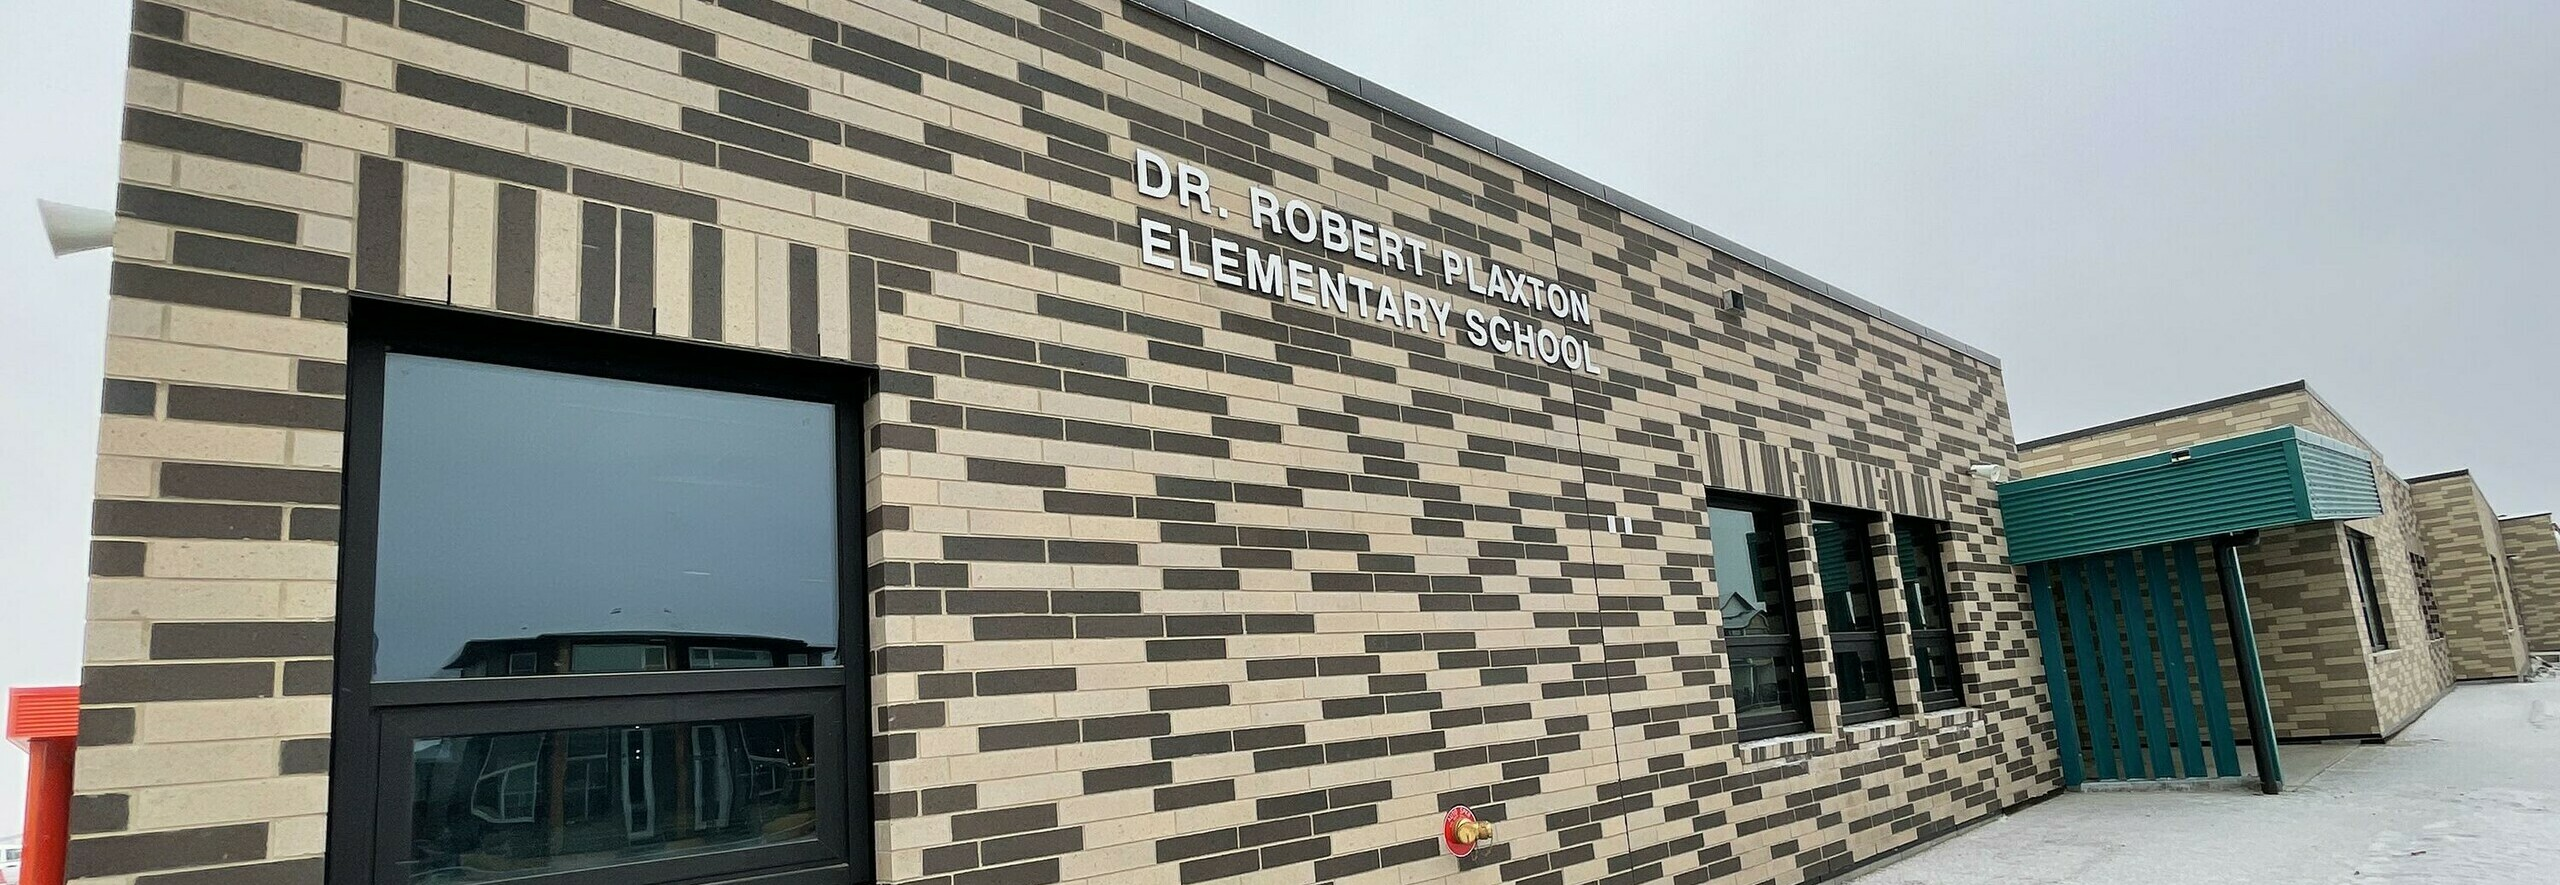 Dr. Robert Plaxton Elementary School Banner Photo